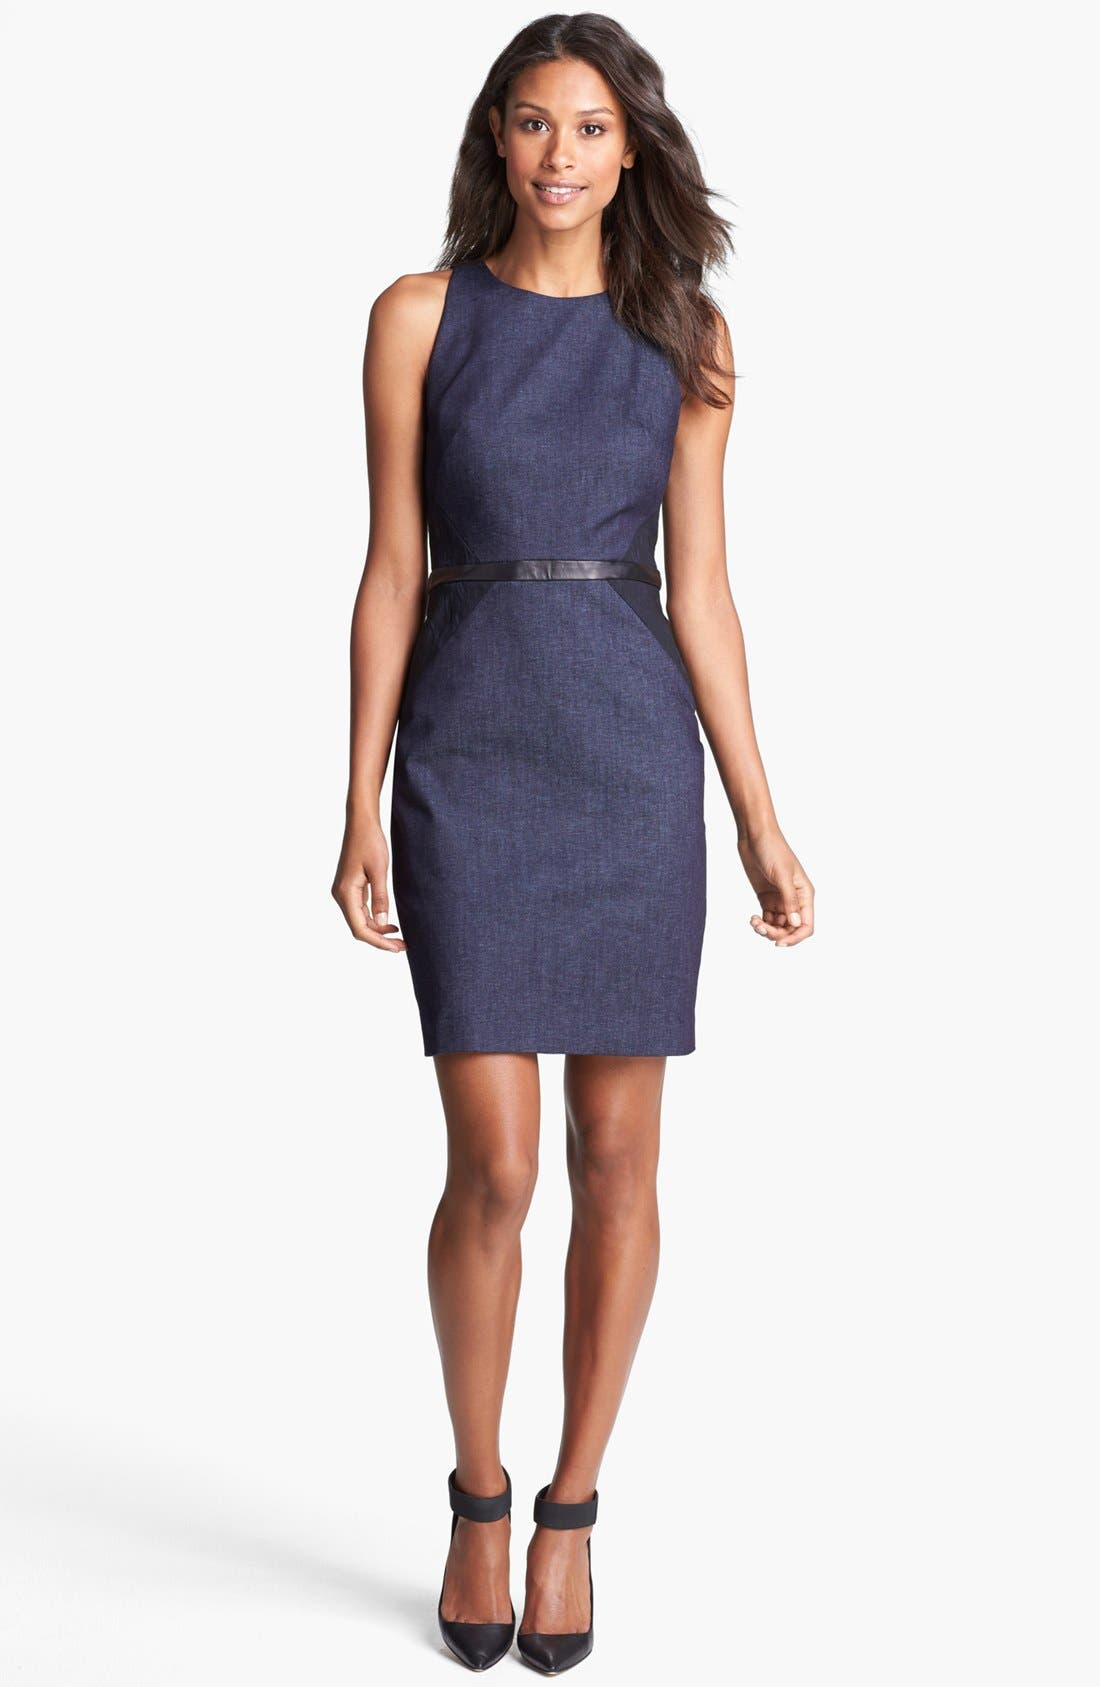 Alternate Image 1 Selected - Nicole Miller Leather Trim Denim Sheath Dress